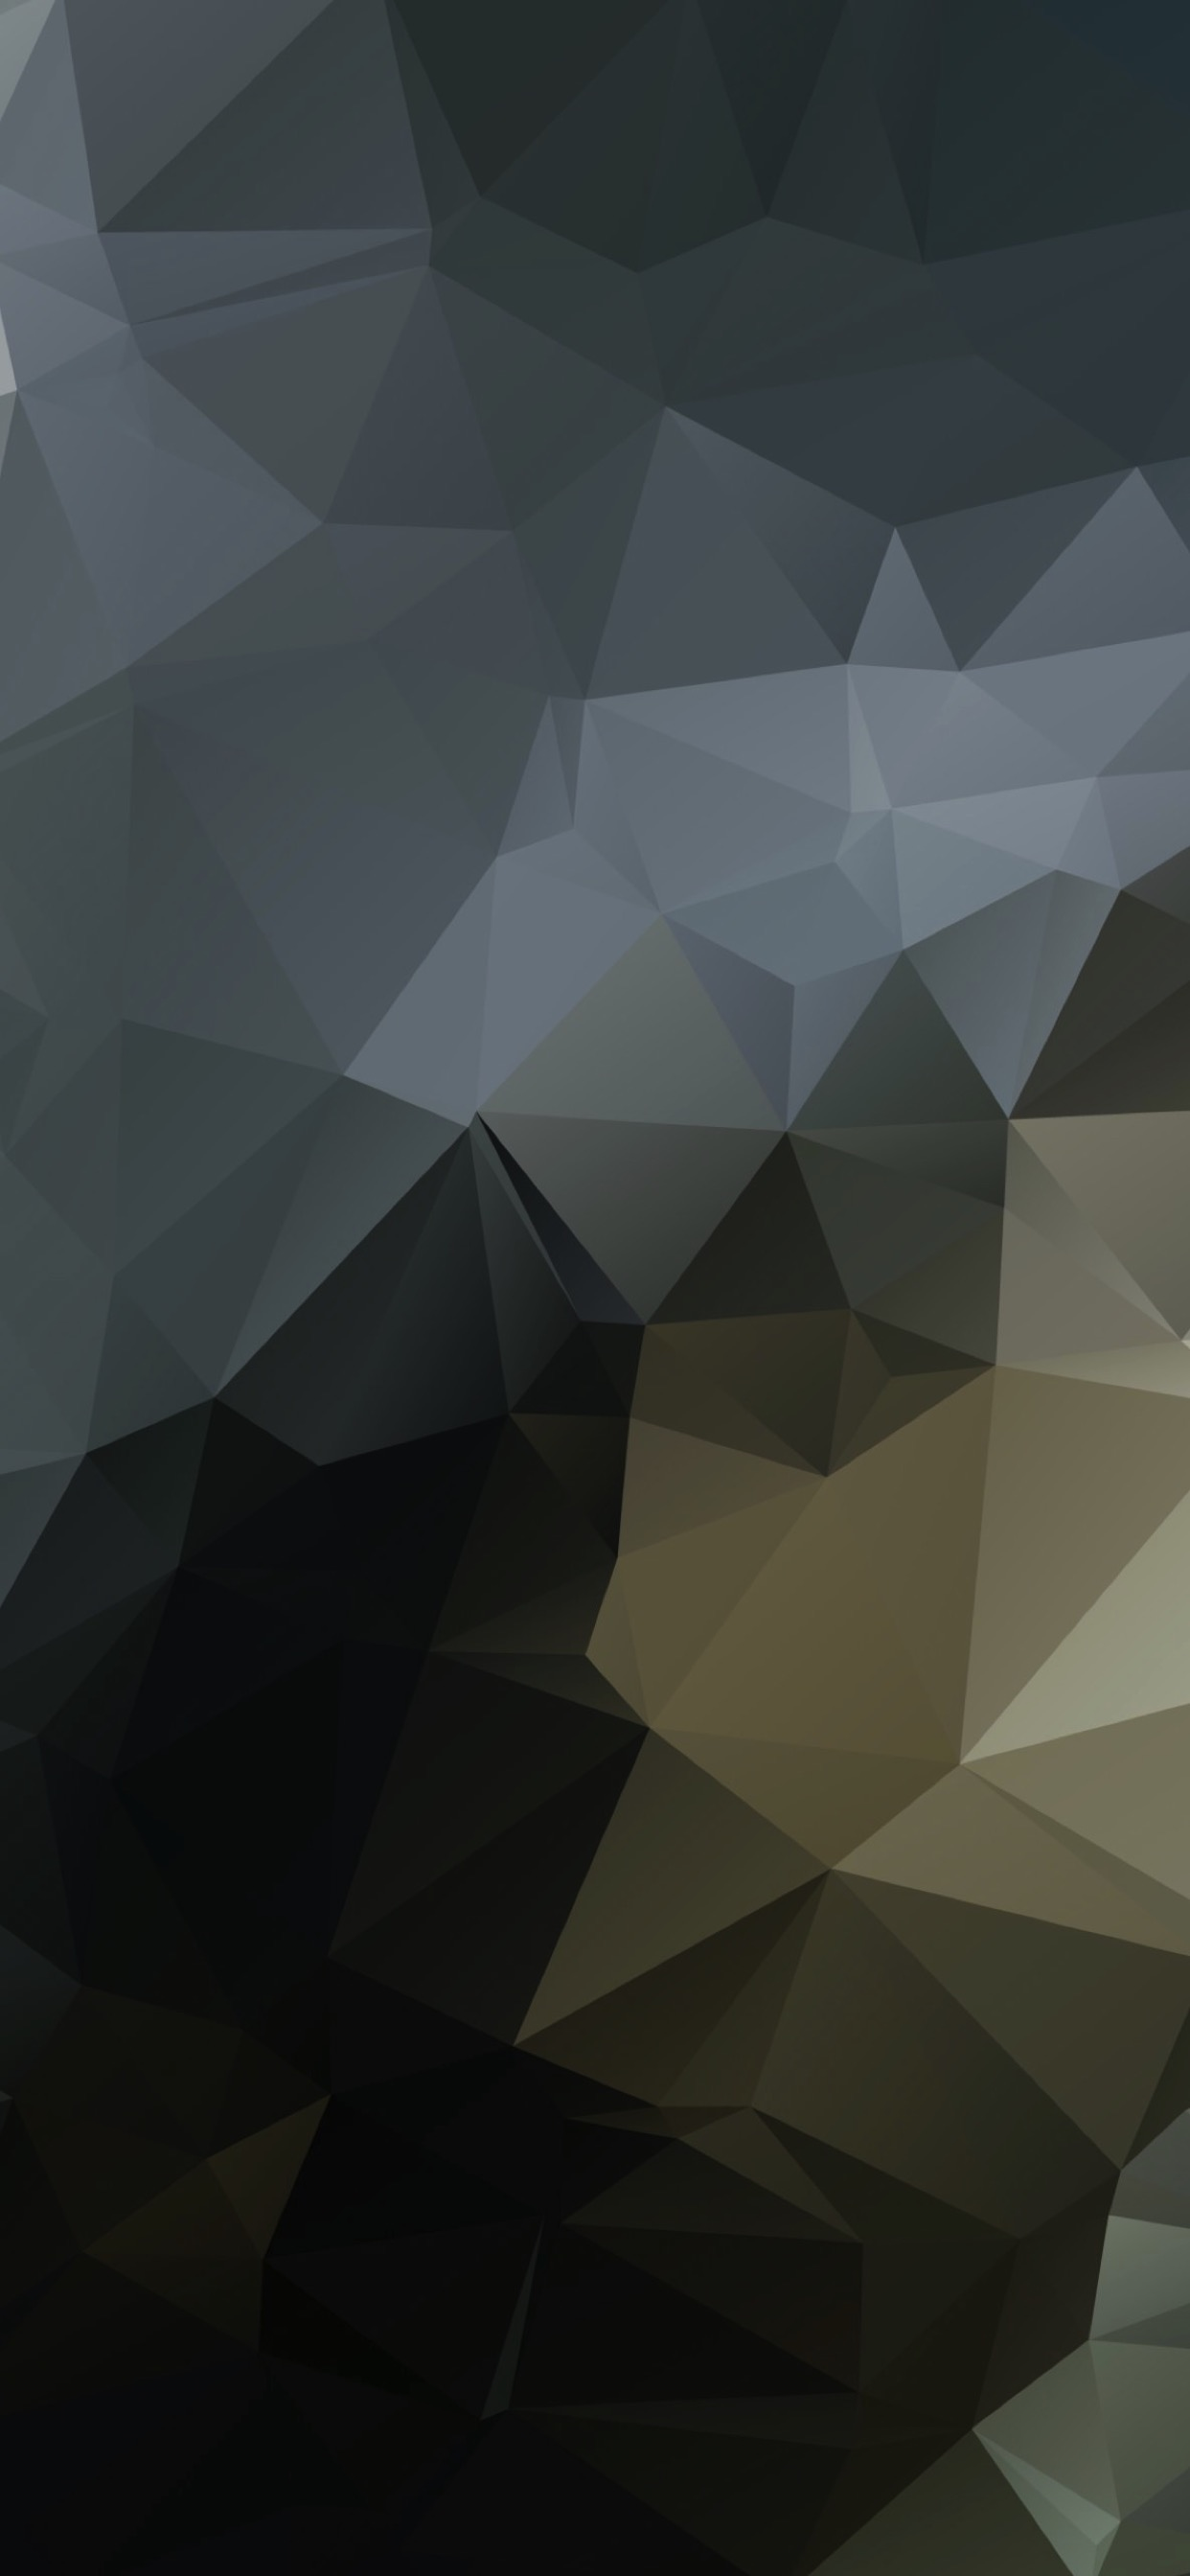 Iphone Xs Max Wallpaper - Iphone Xs Max Grey - HD Wallpaper